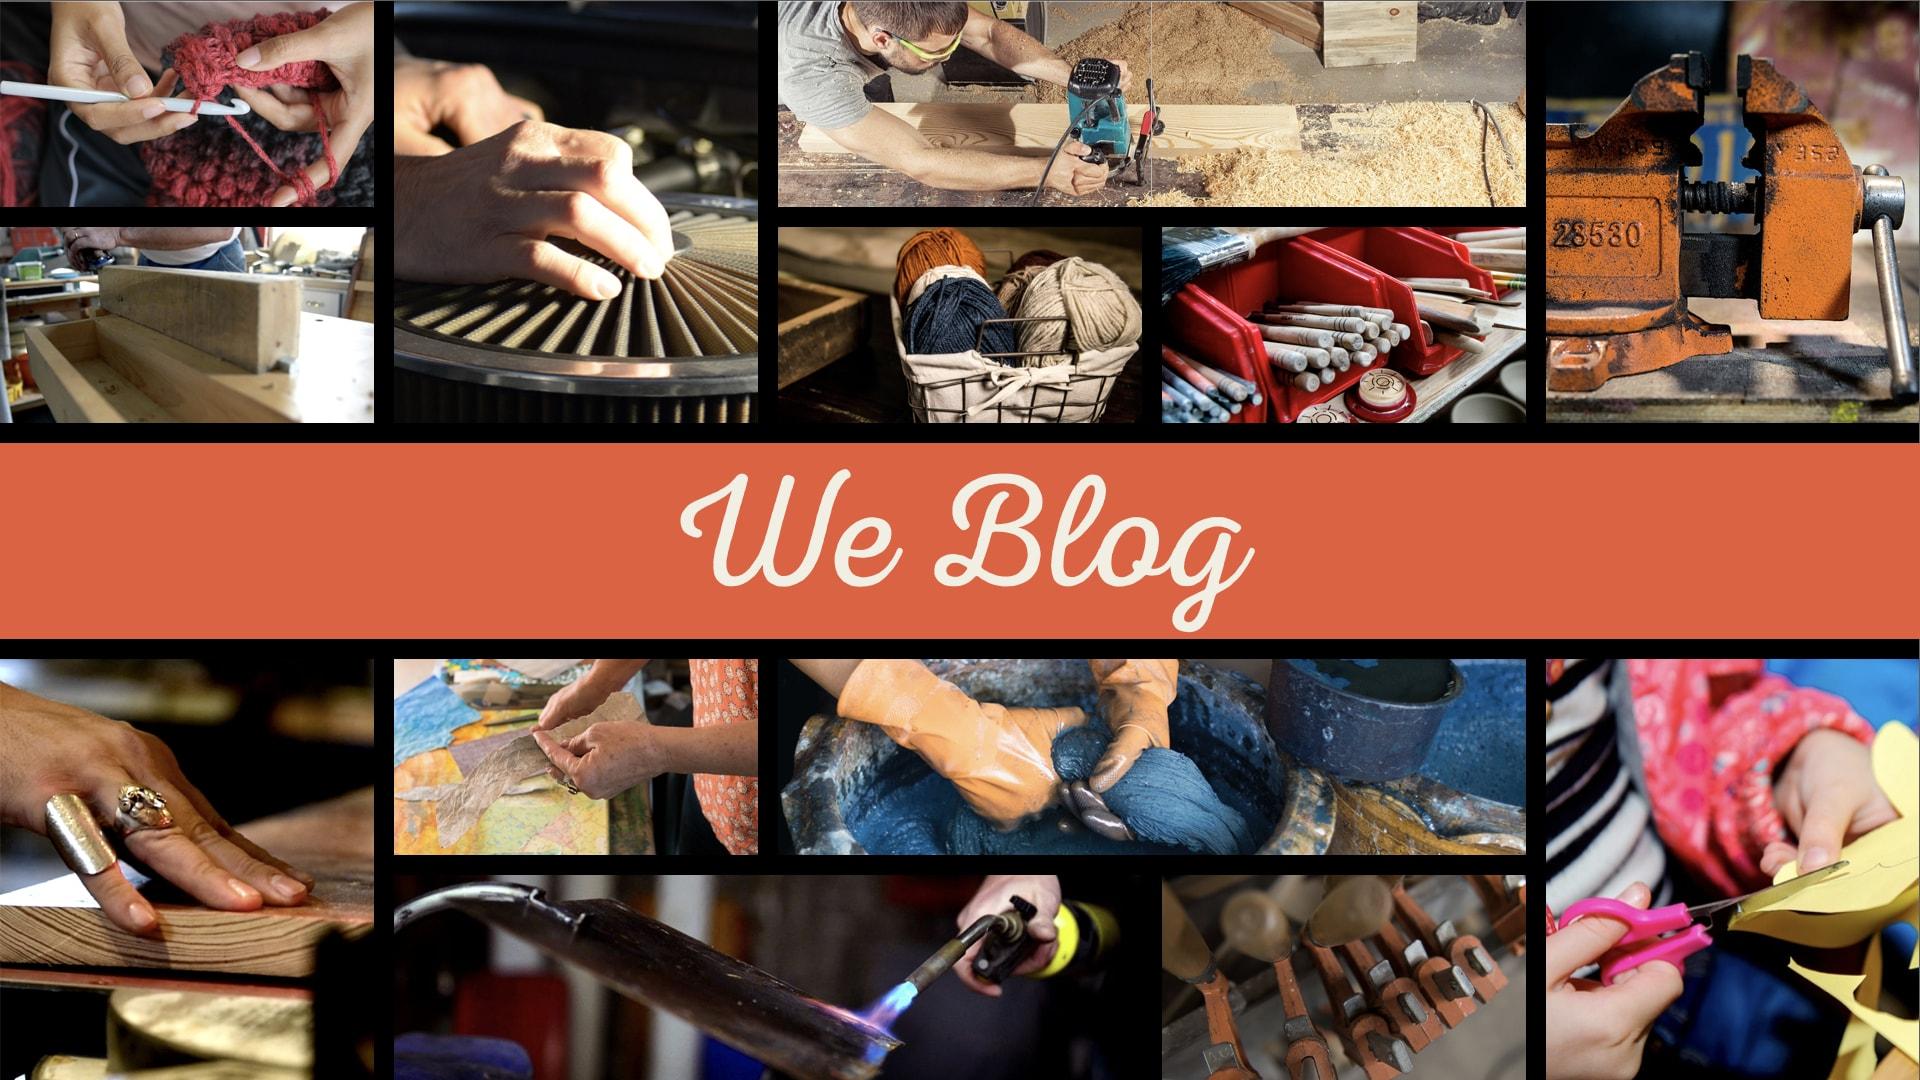 We-Blog-Banner-1920x1080-min